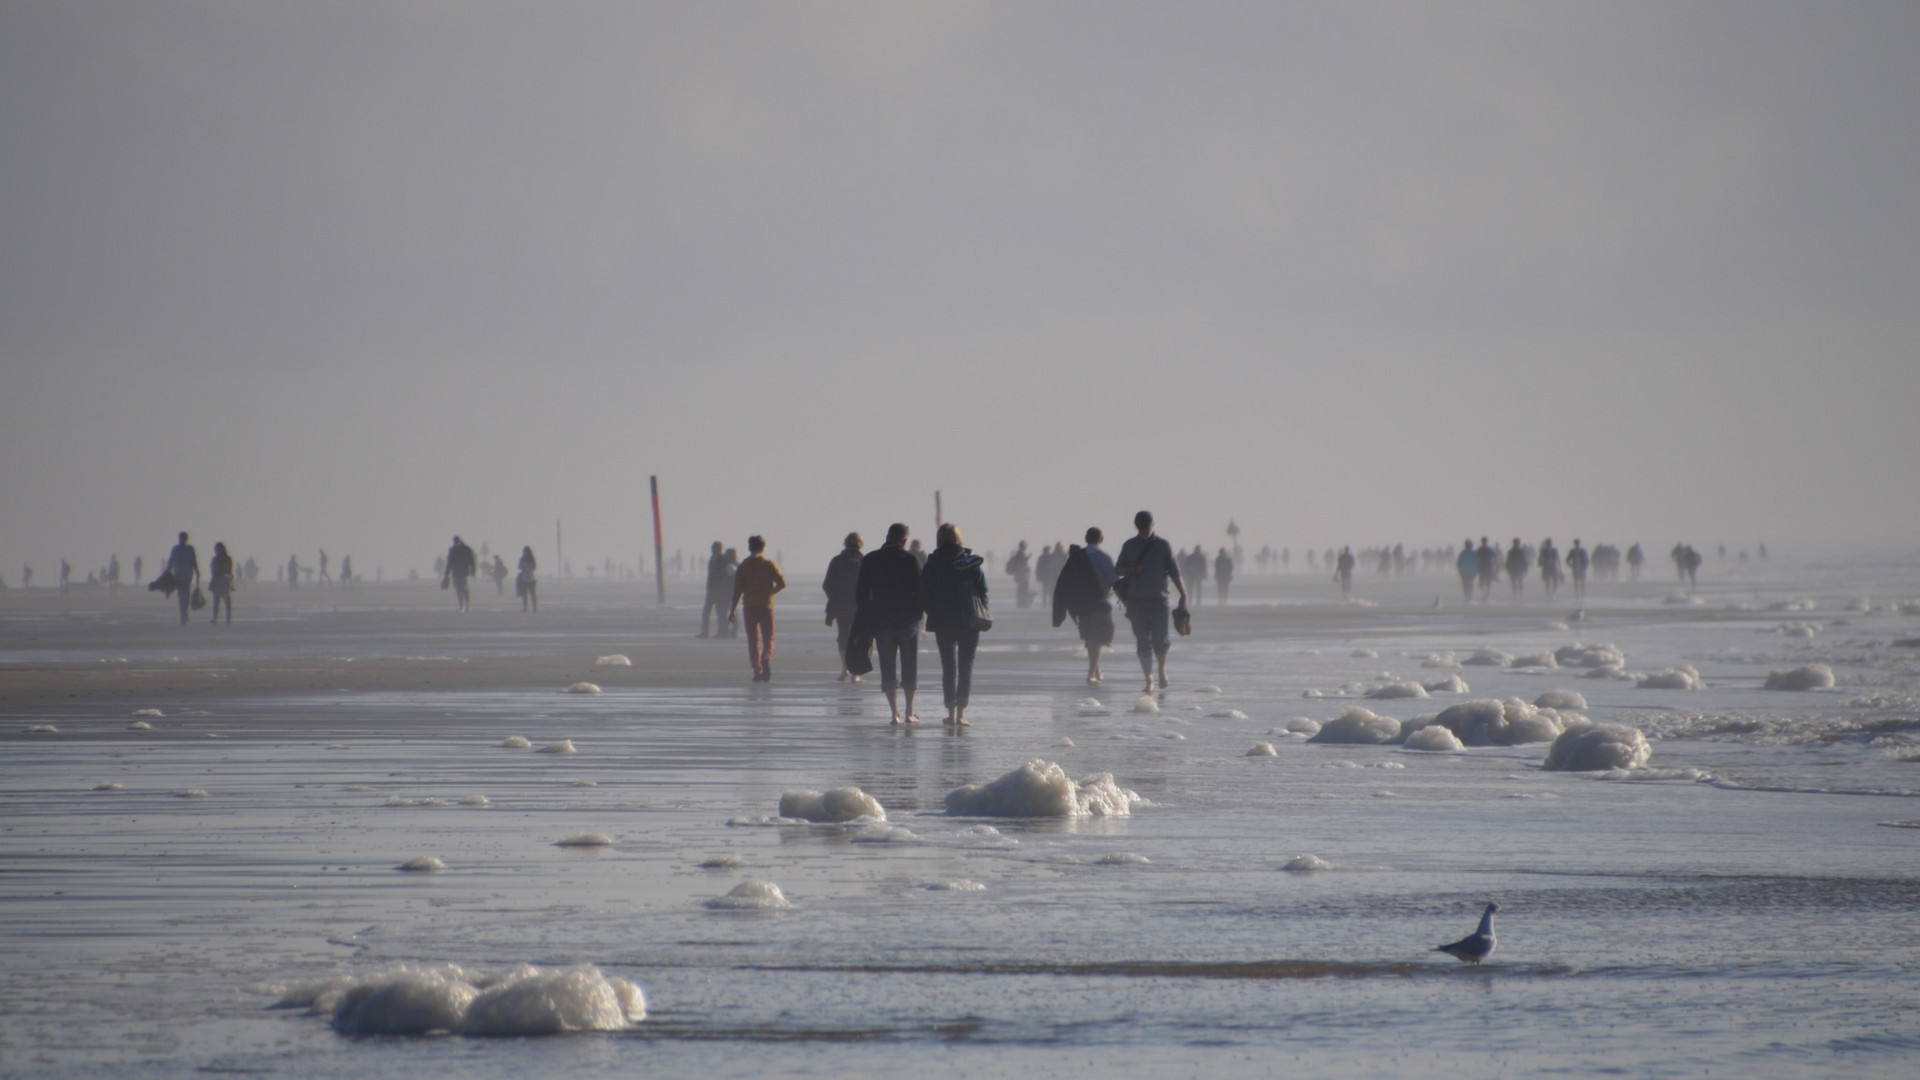 Strandgang in Sankt Peter-Ording